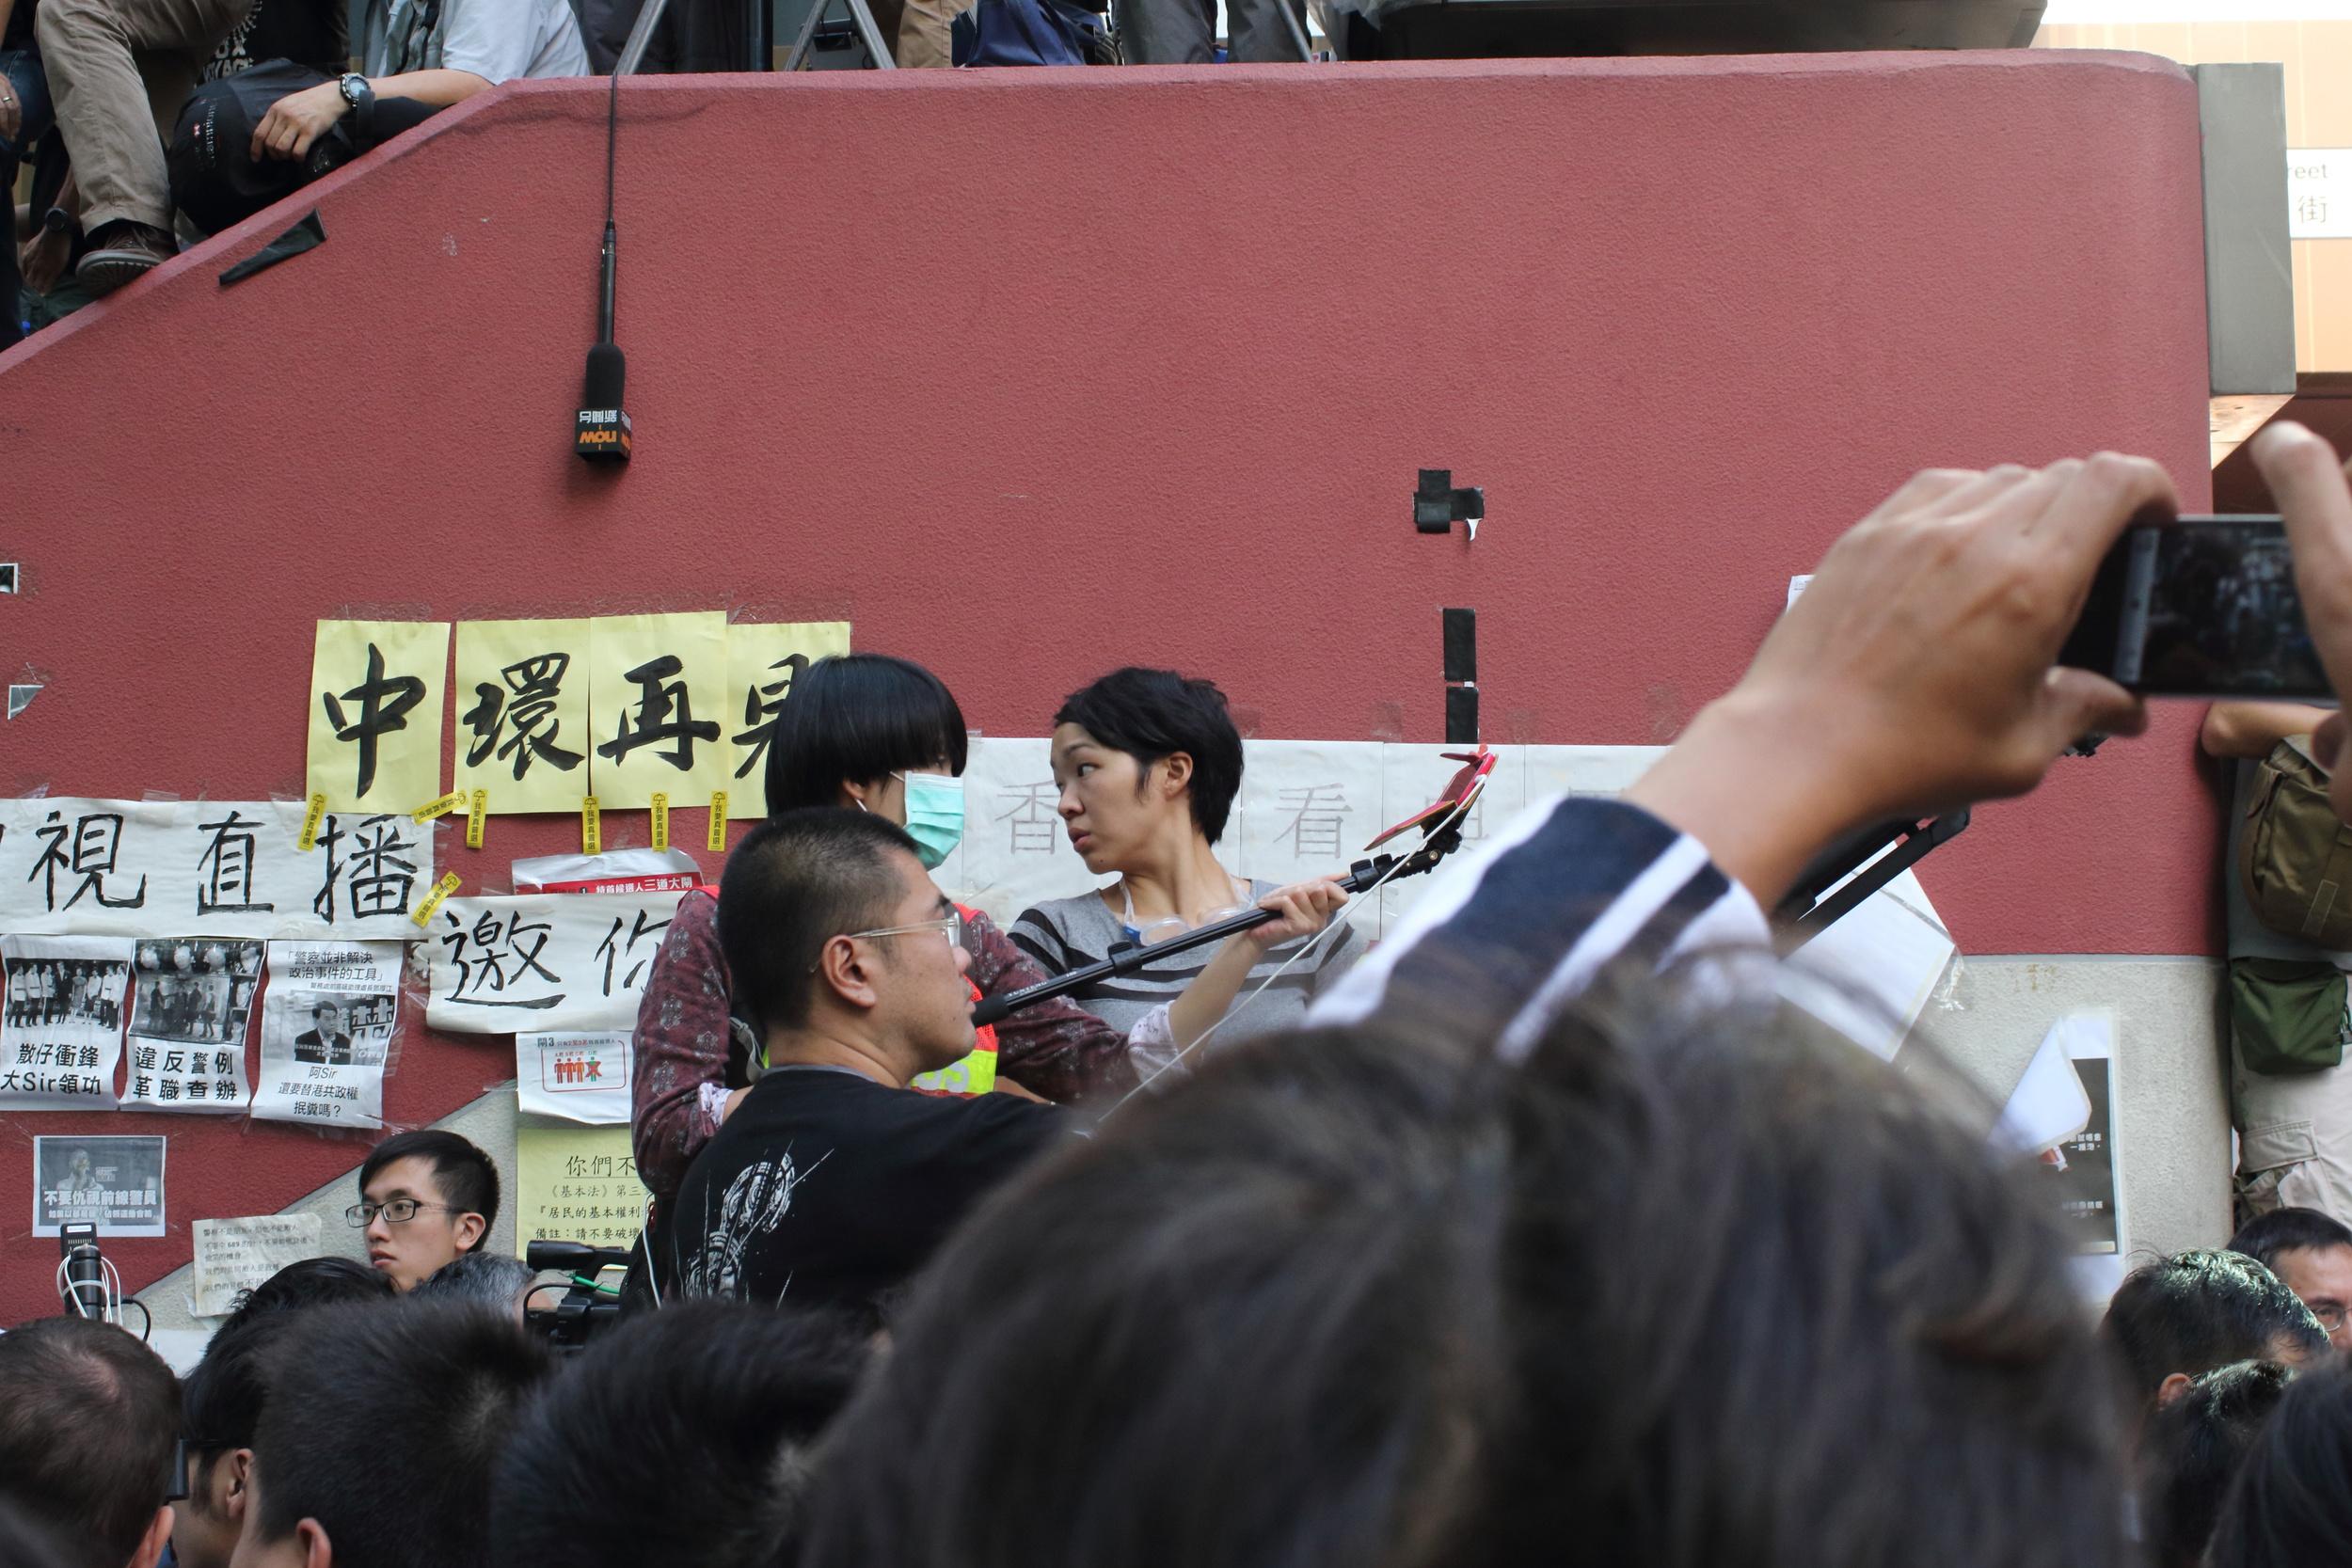 jfung1 Mongkok Argyle Clearance12.JPG